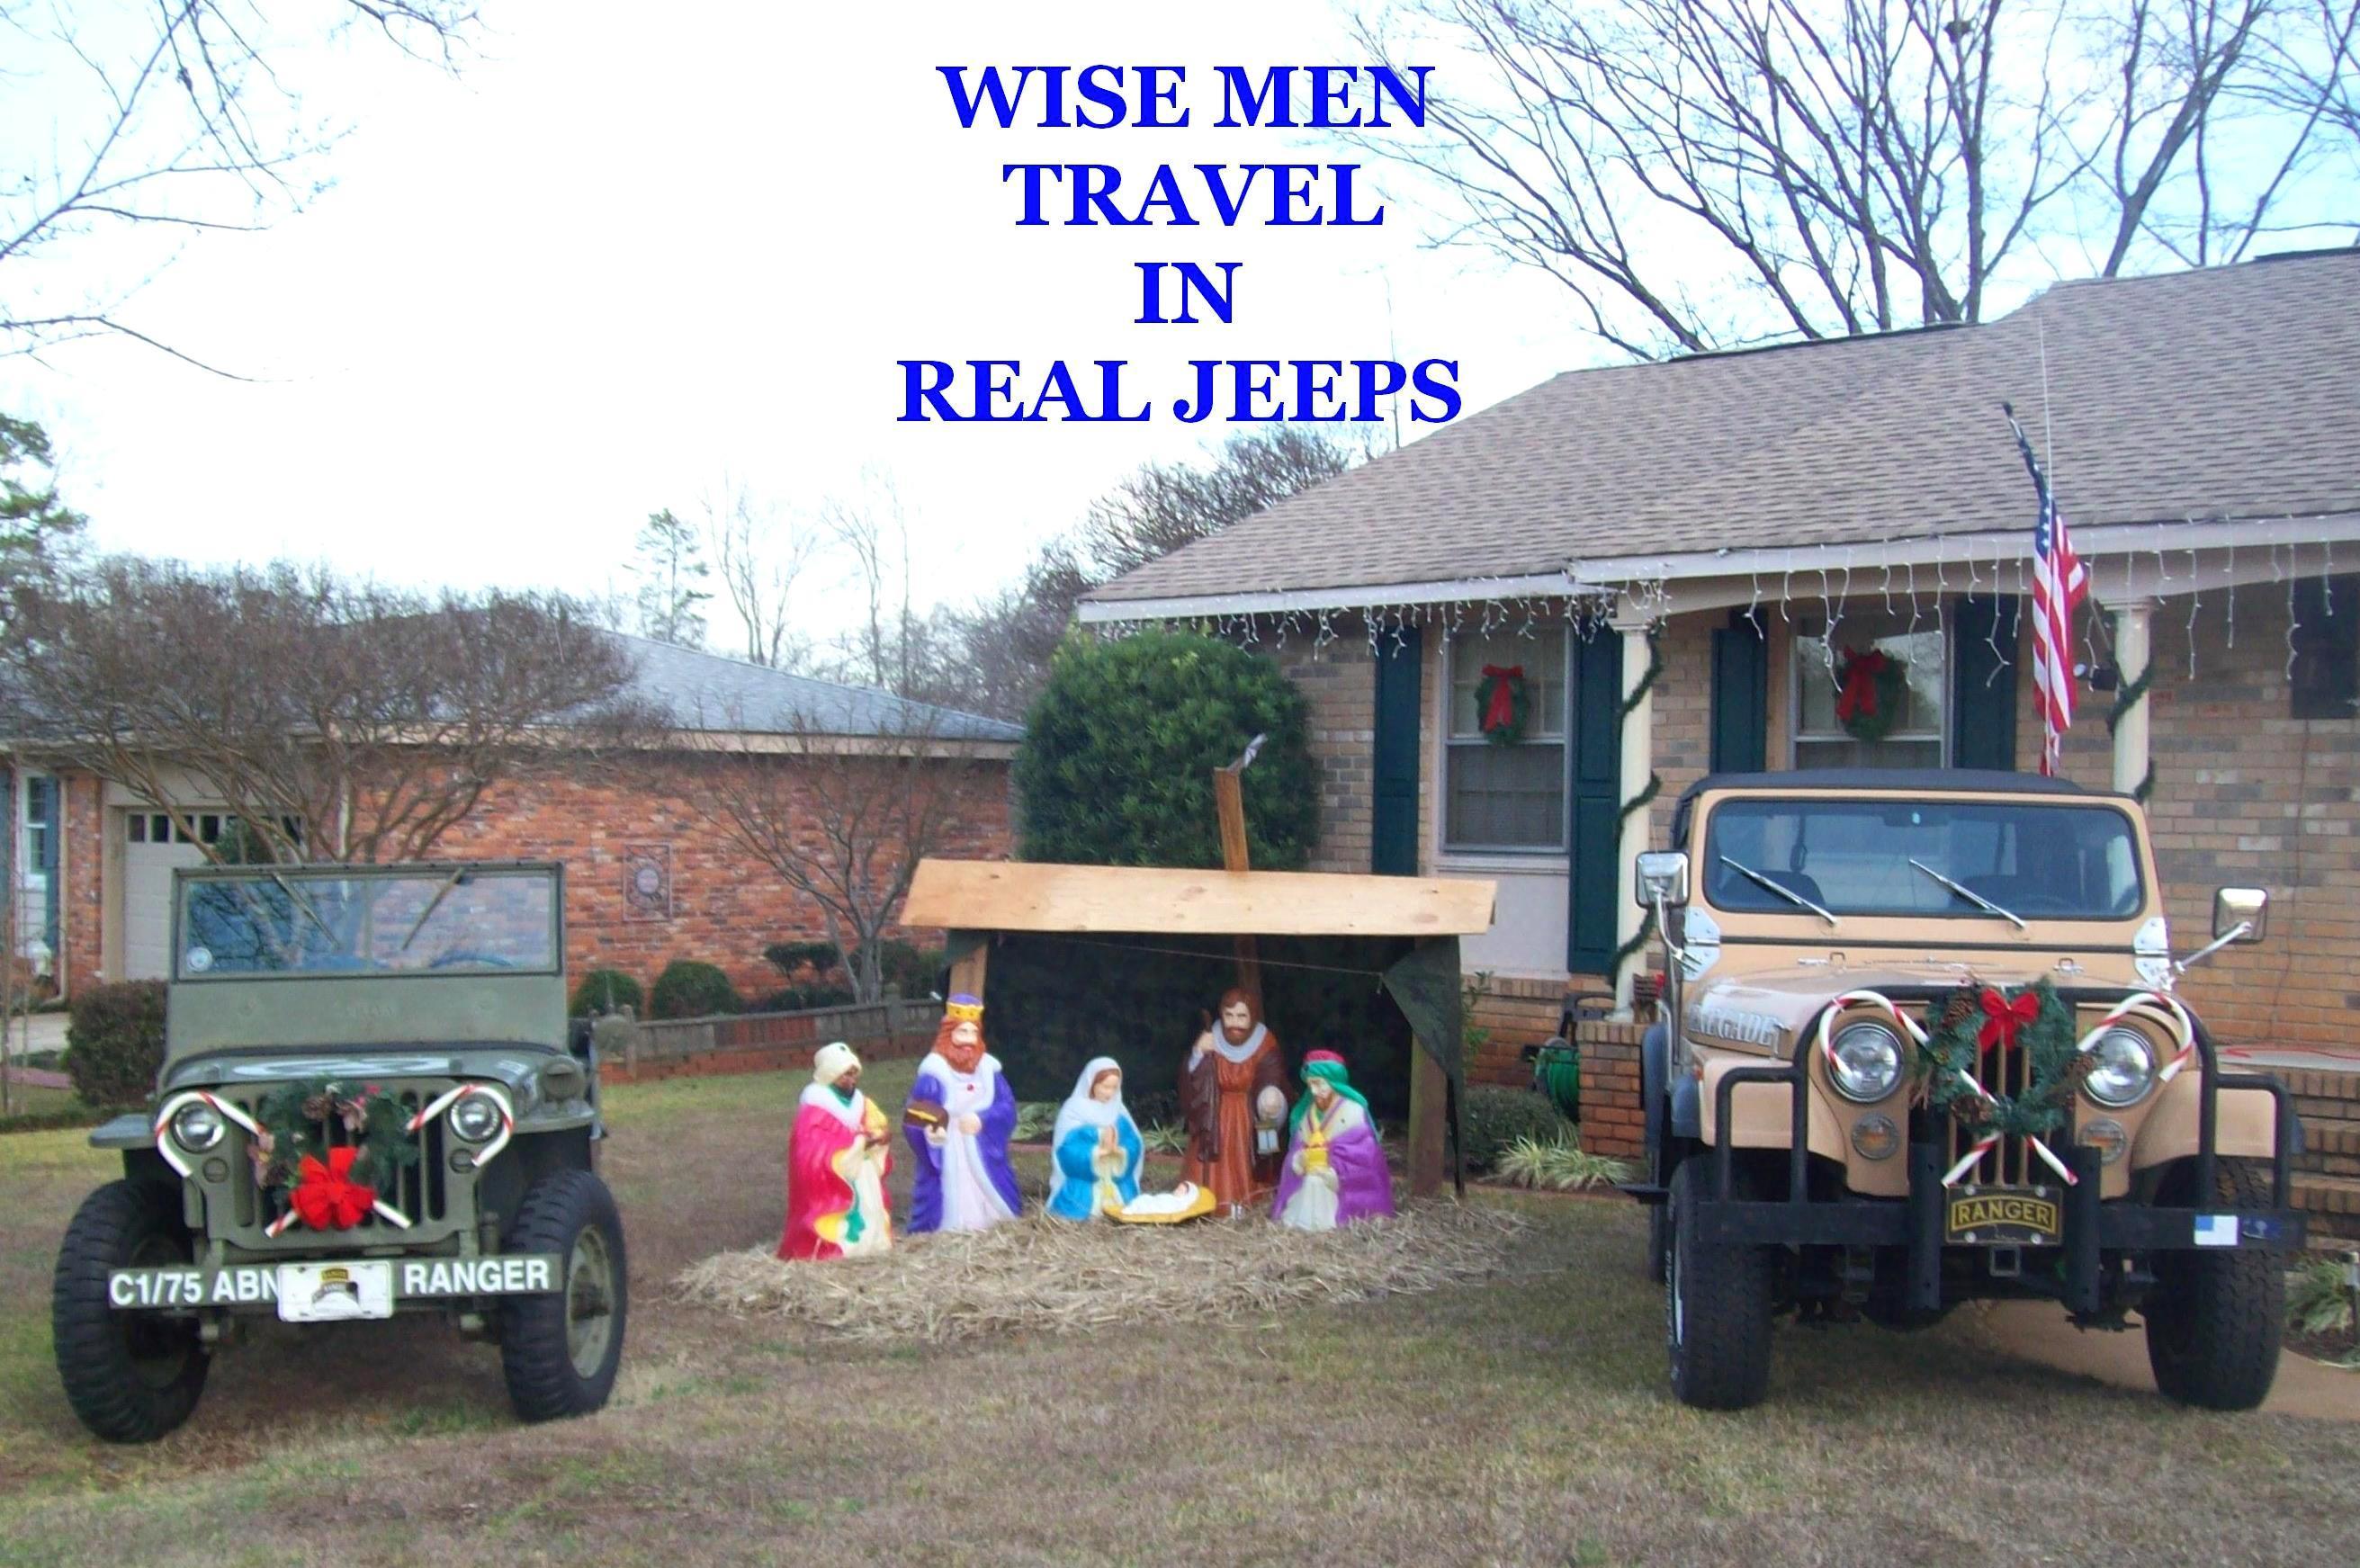 1978 Jeep Cj5 Ignition Problems I Have A 258 42l 78 Engine Cj7 Solenoid Wiring Thumb